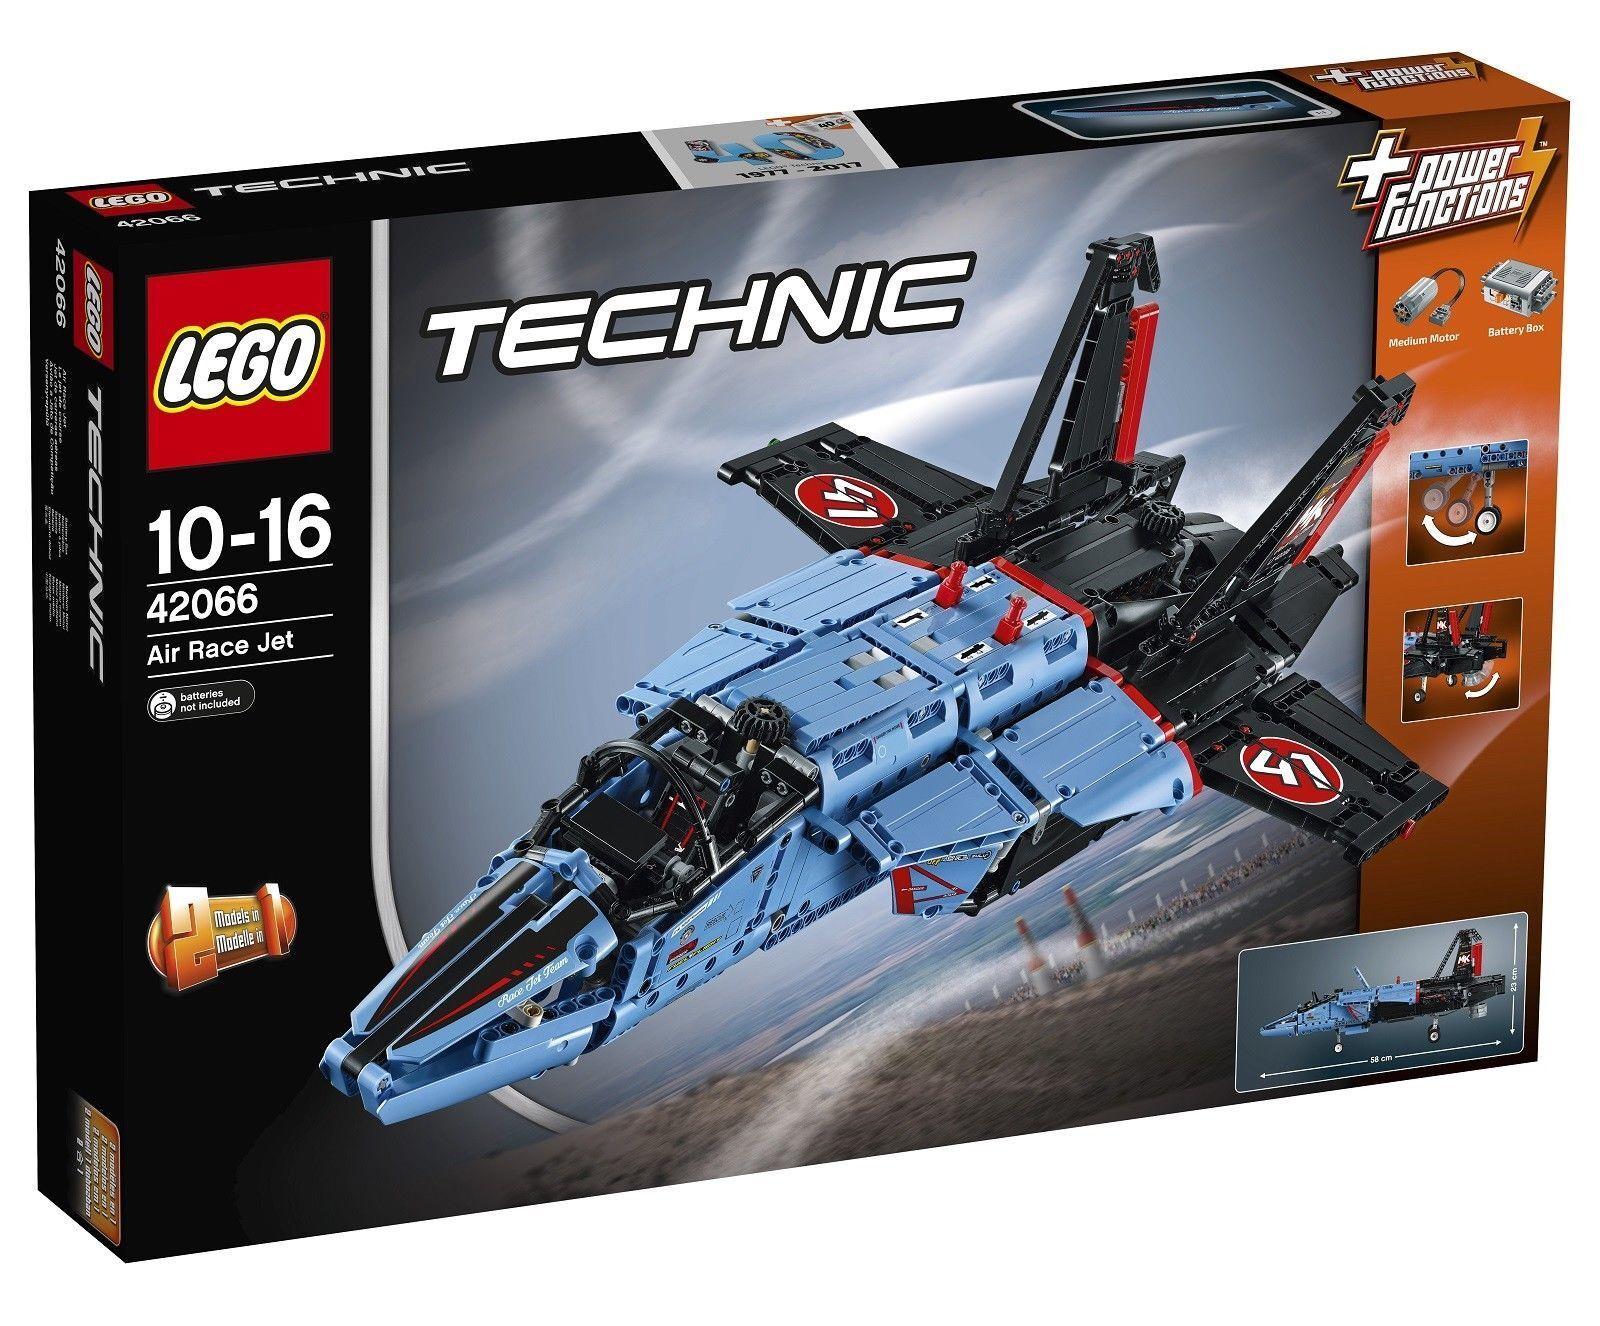 LEGO Technic Air Race Jet 2017 (42066) - BRAND NEW RETIRED